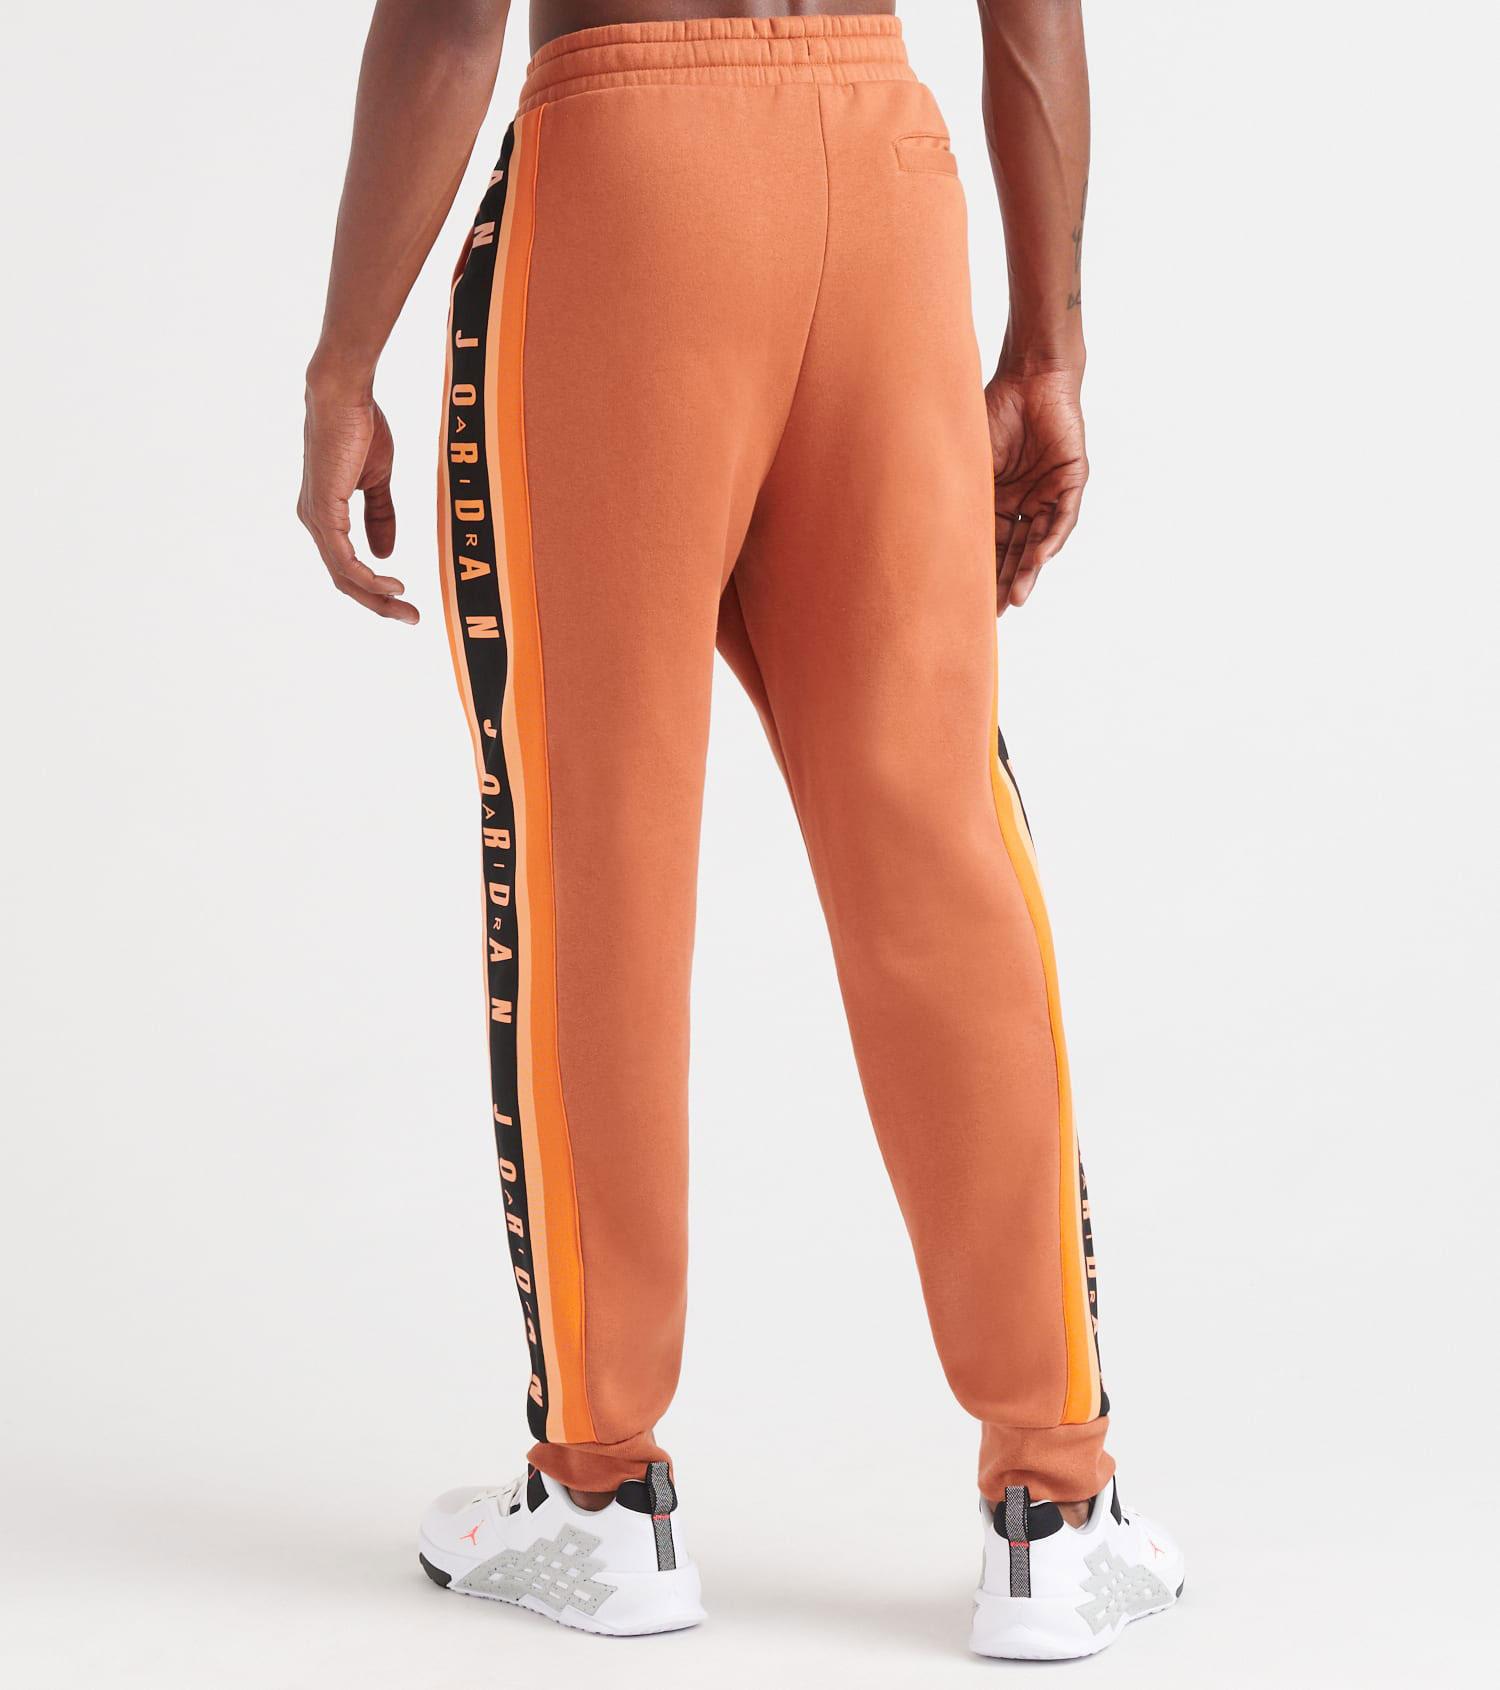 jordan-1-shattered-backboard-pants-3